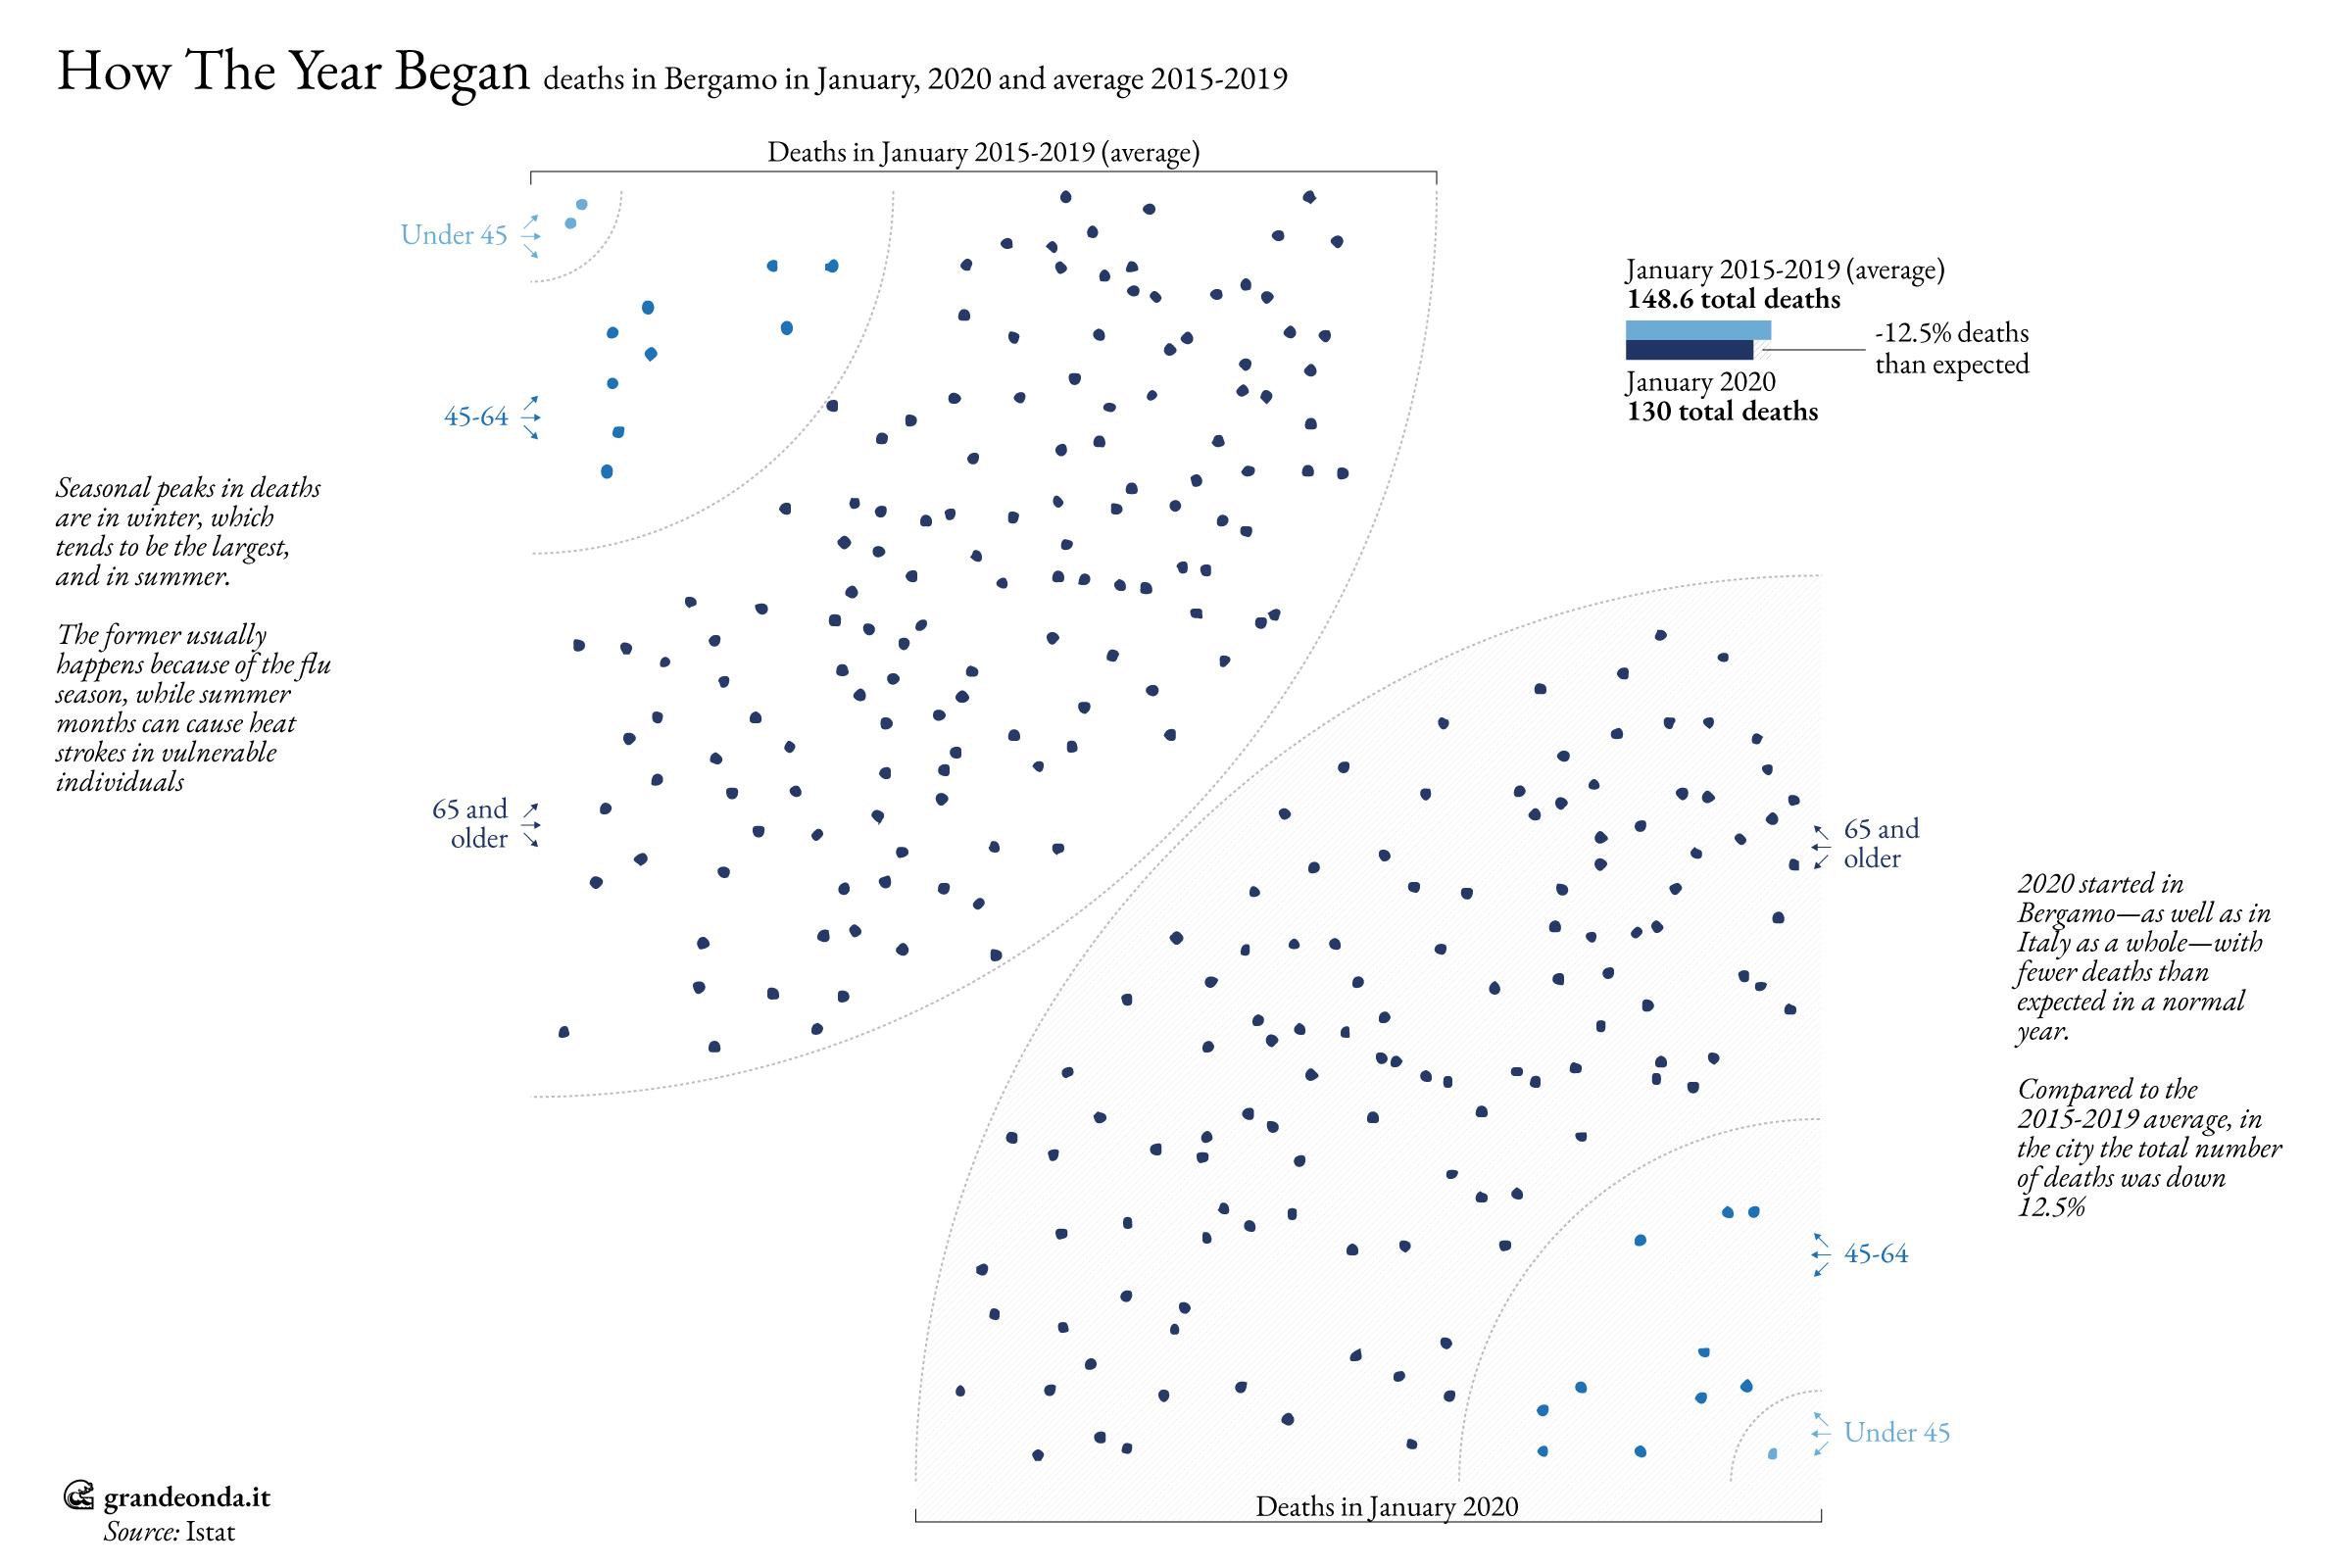 Death in Bergamo in January 2020